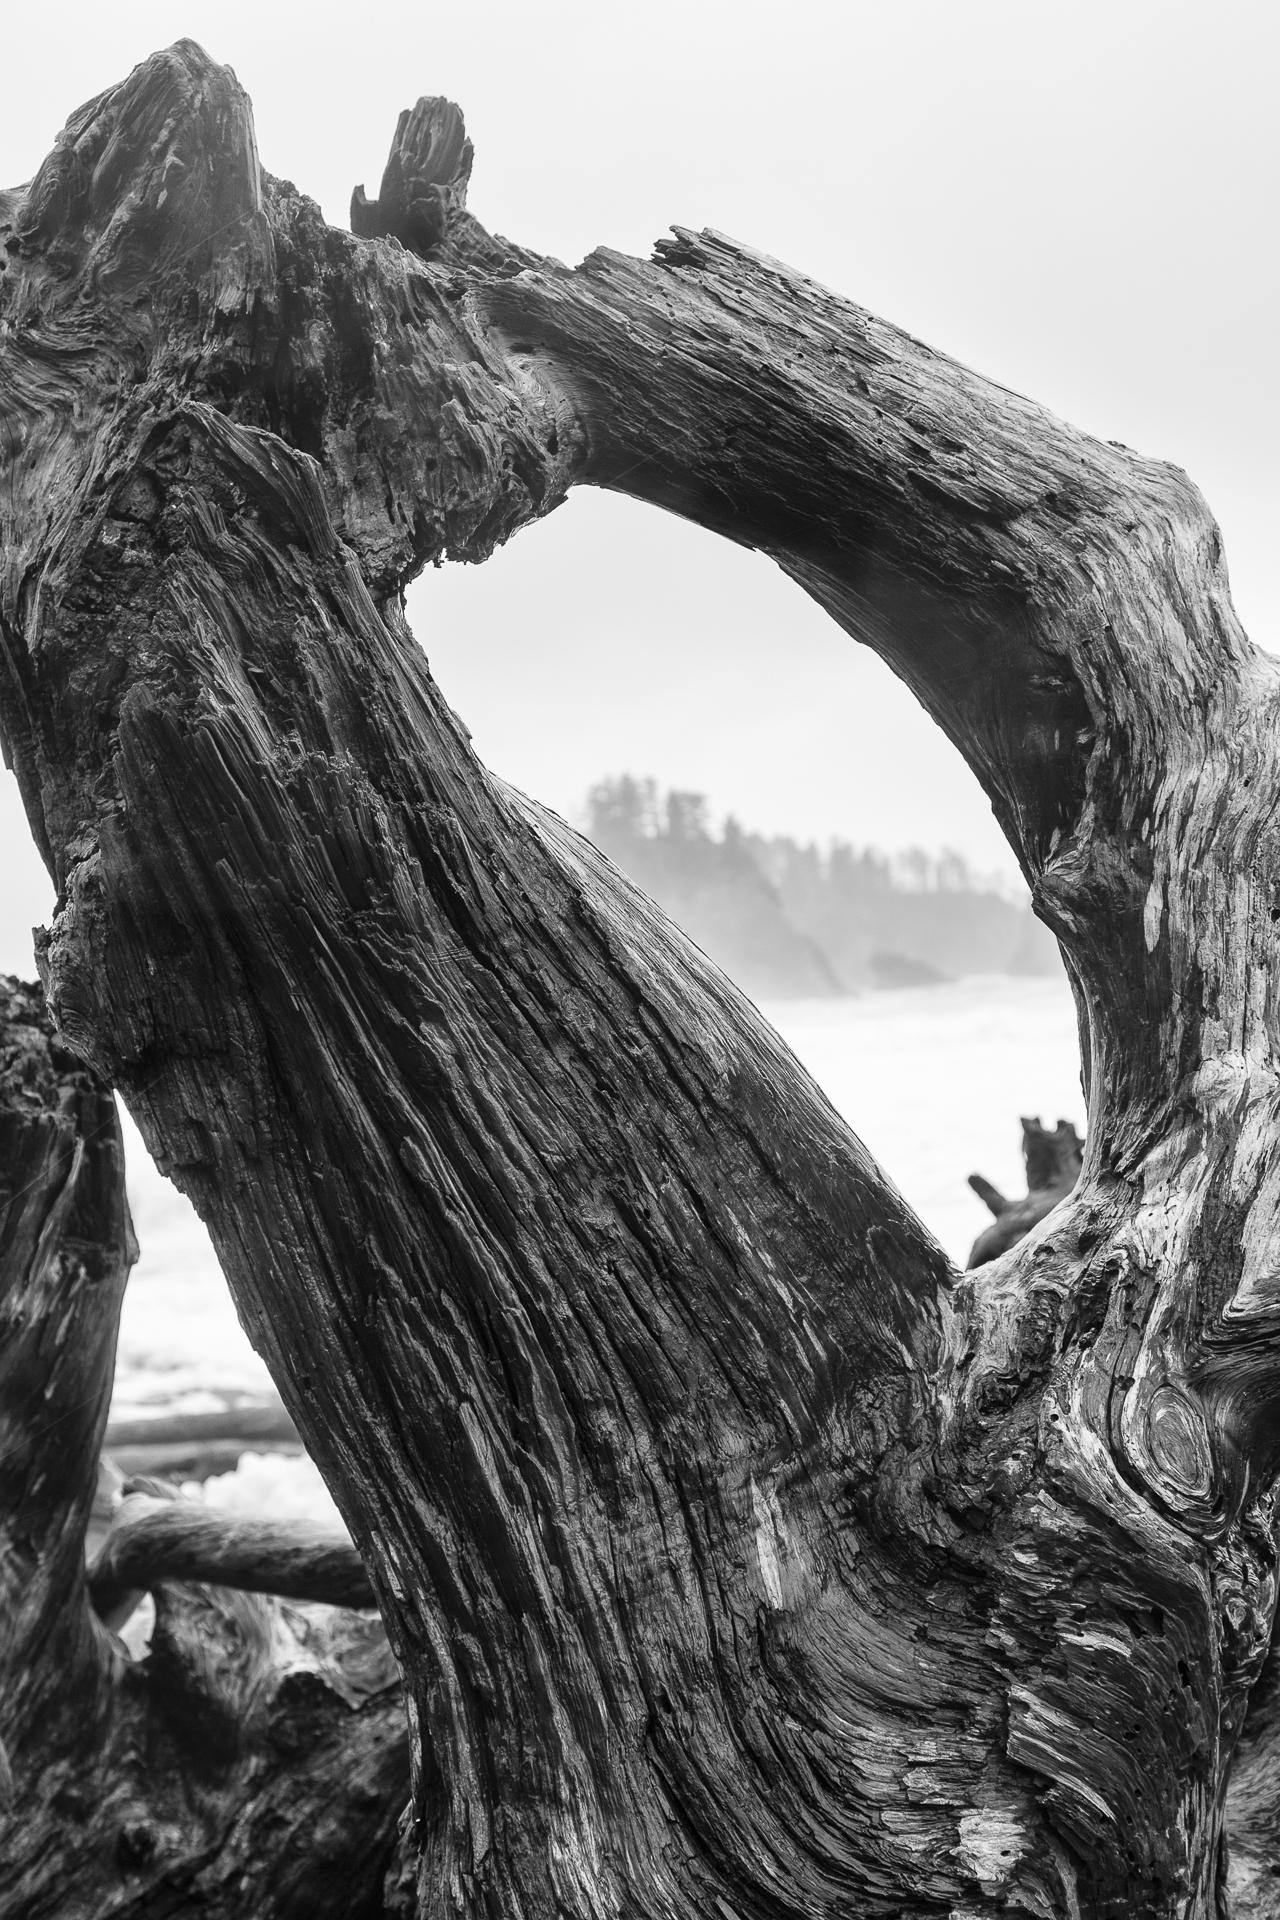 Driftwood on Rialto Beach.